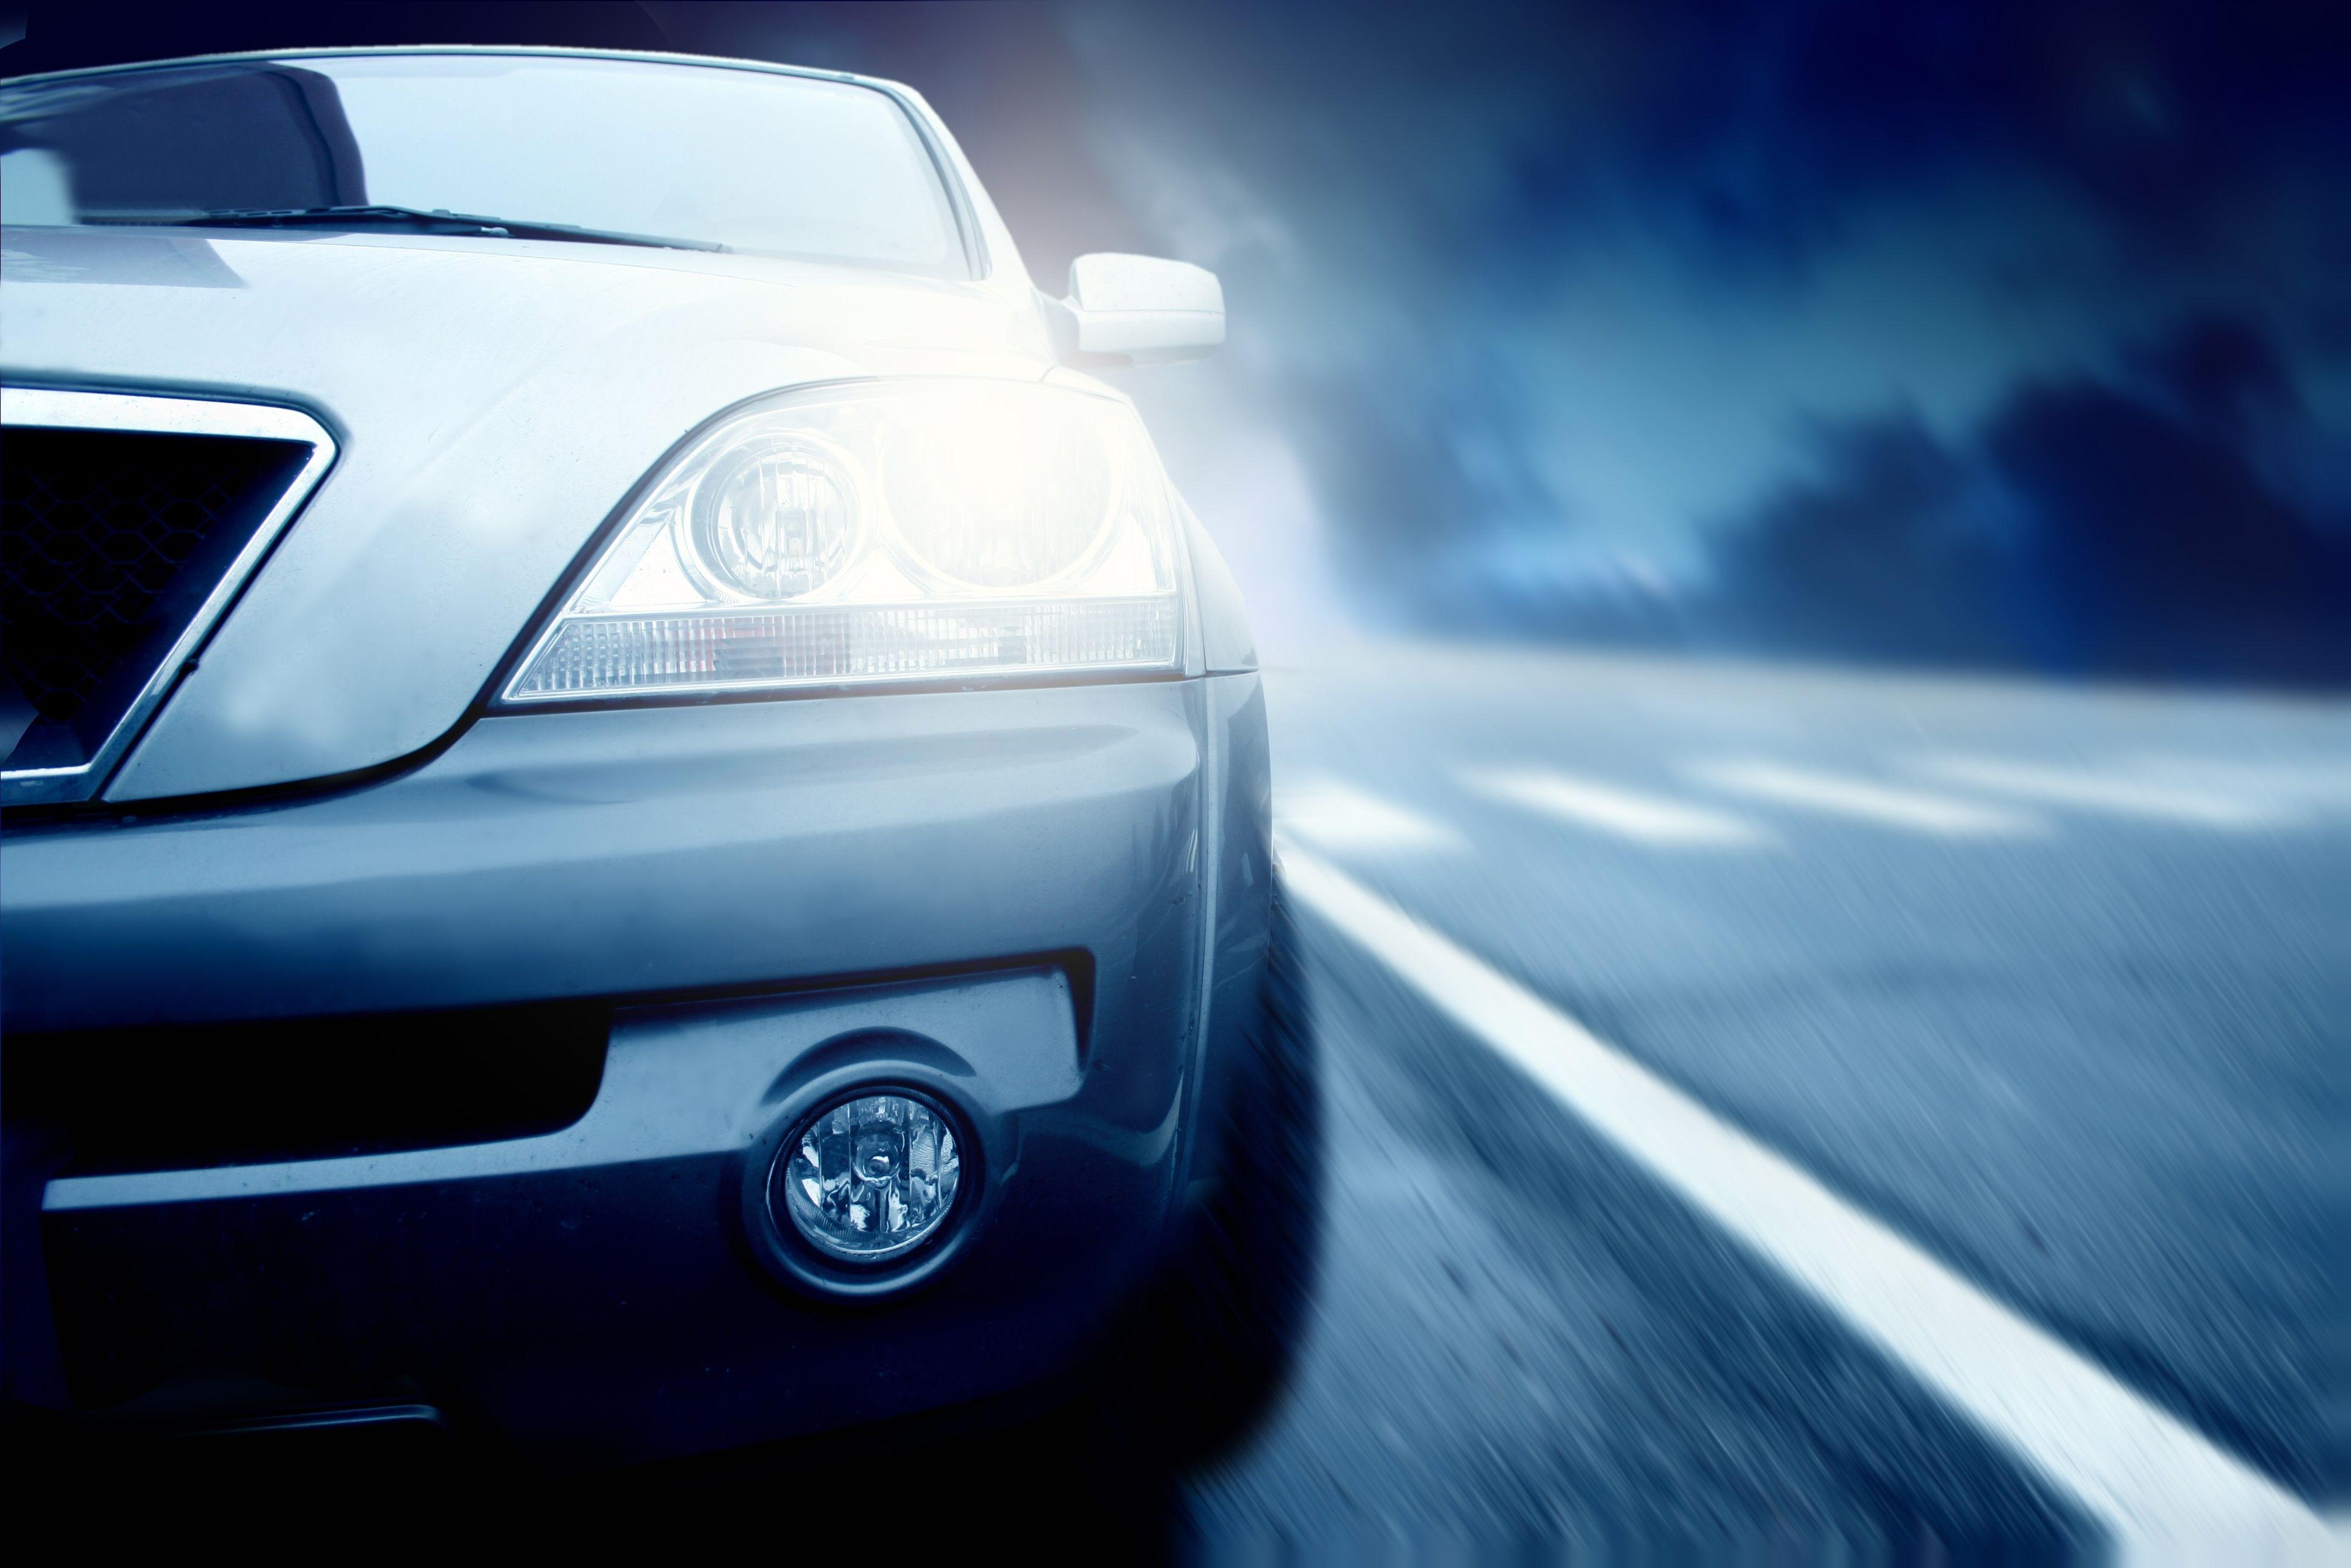 http://www.carinsurancerates.com   Cheap car insurance ...